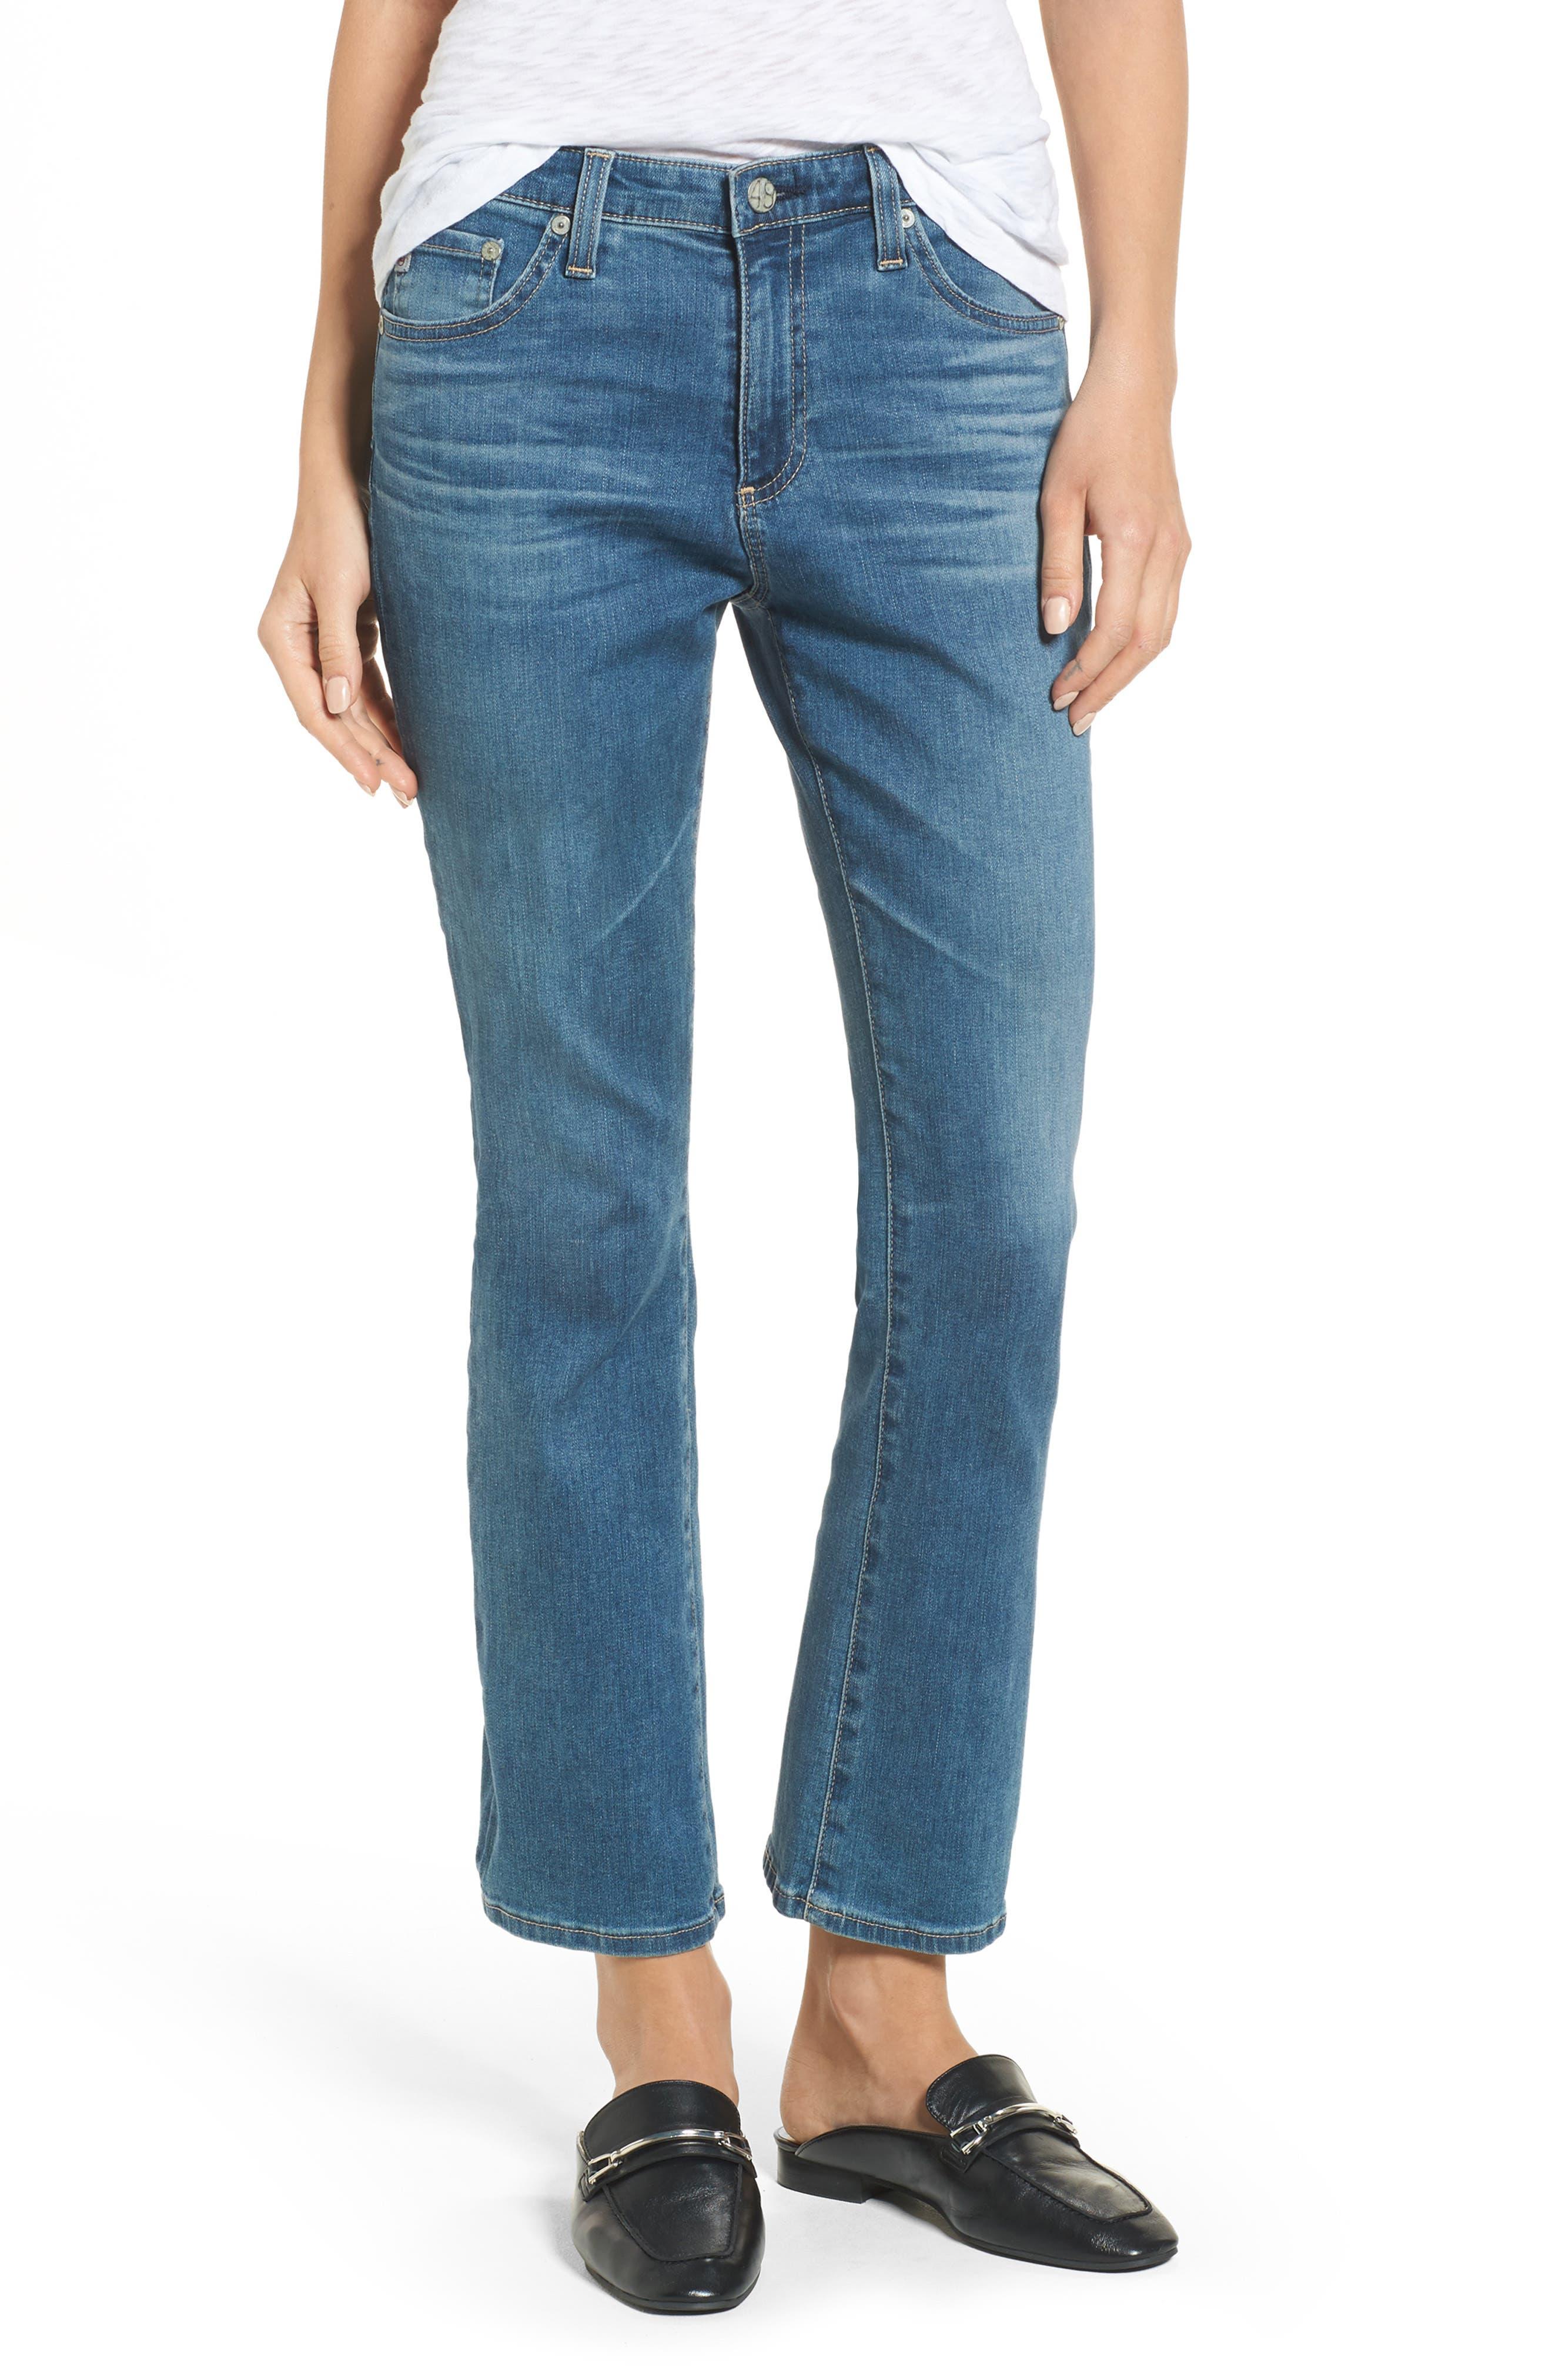 Jodi High Waist Crop Jeans,                             Main thumbnail 1, color,                             414